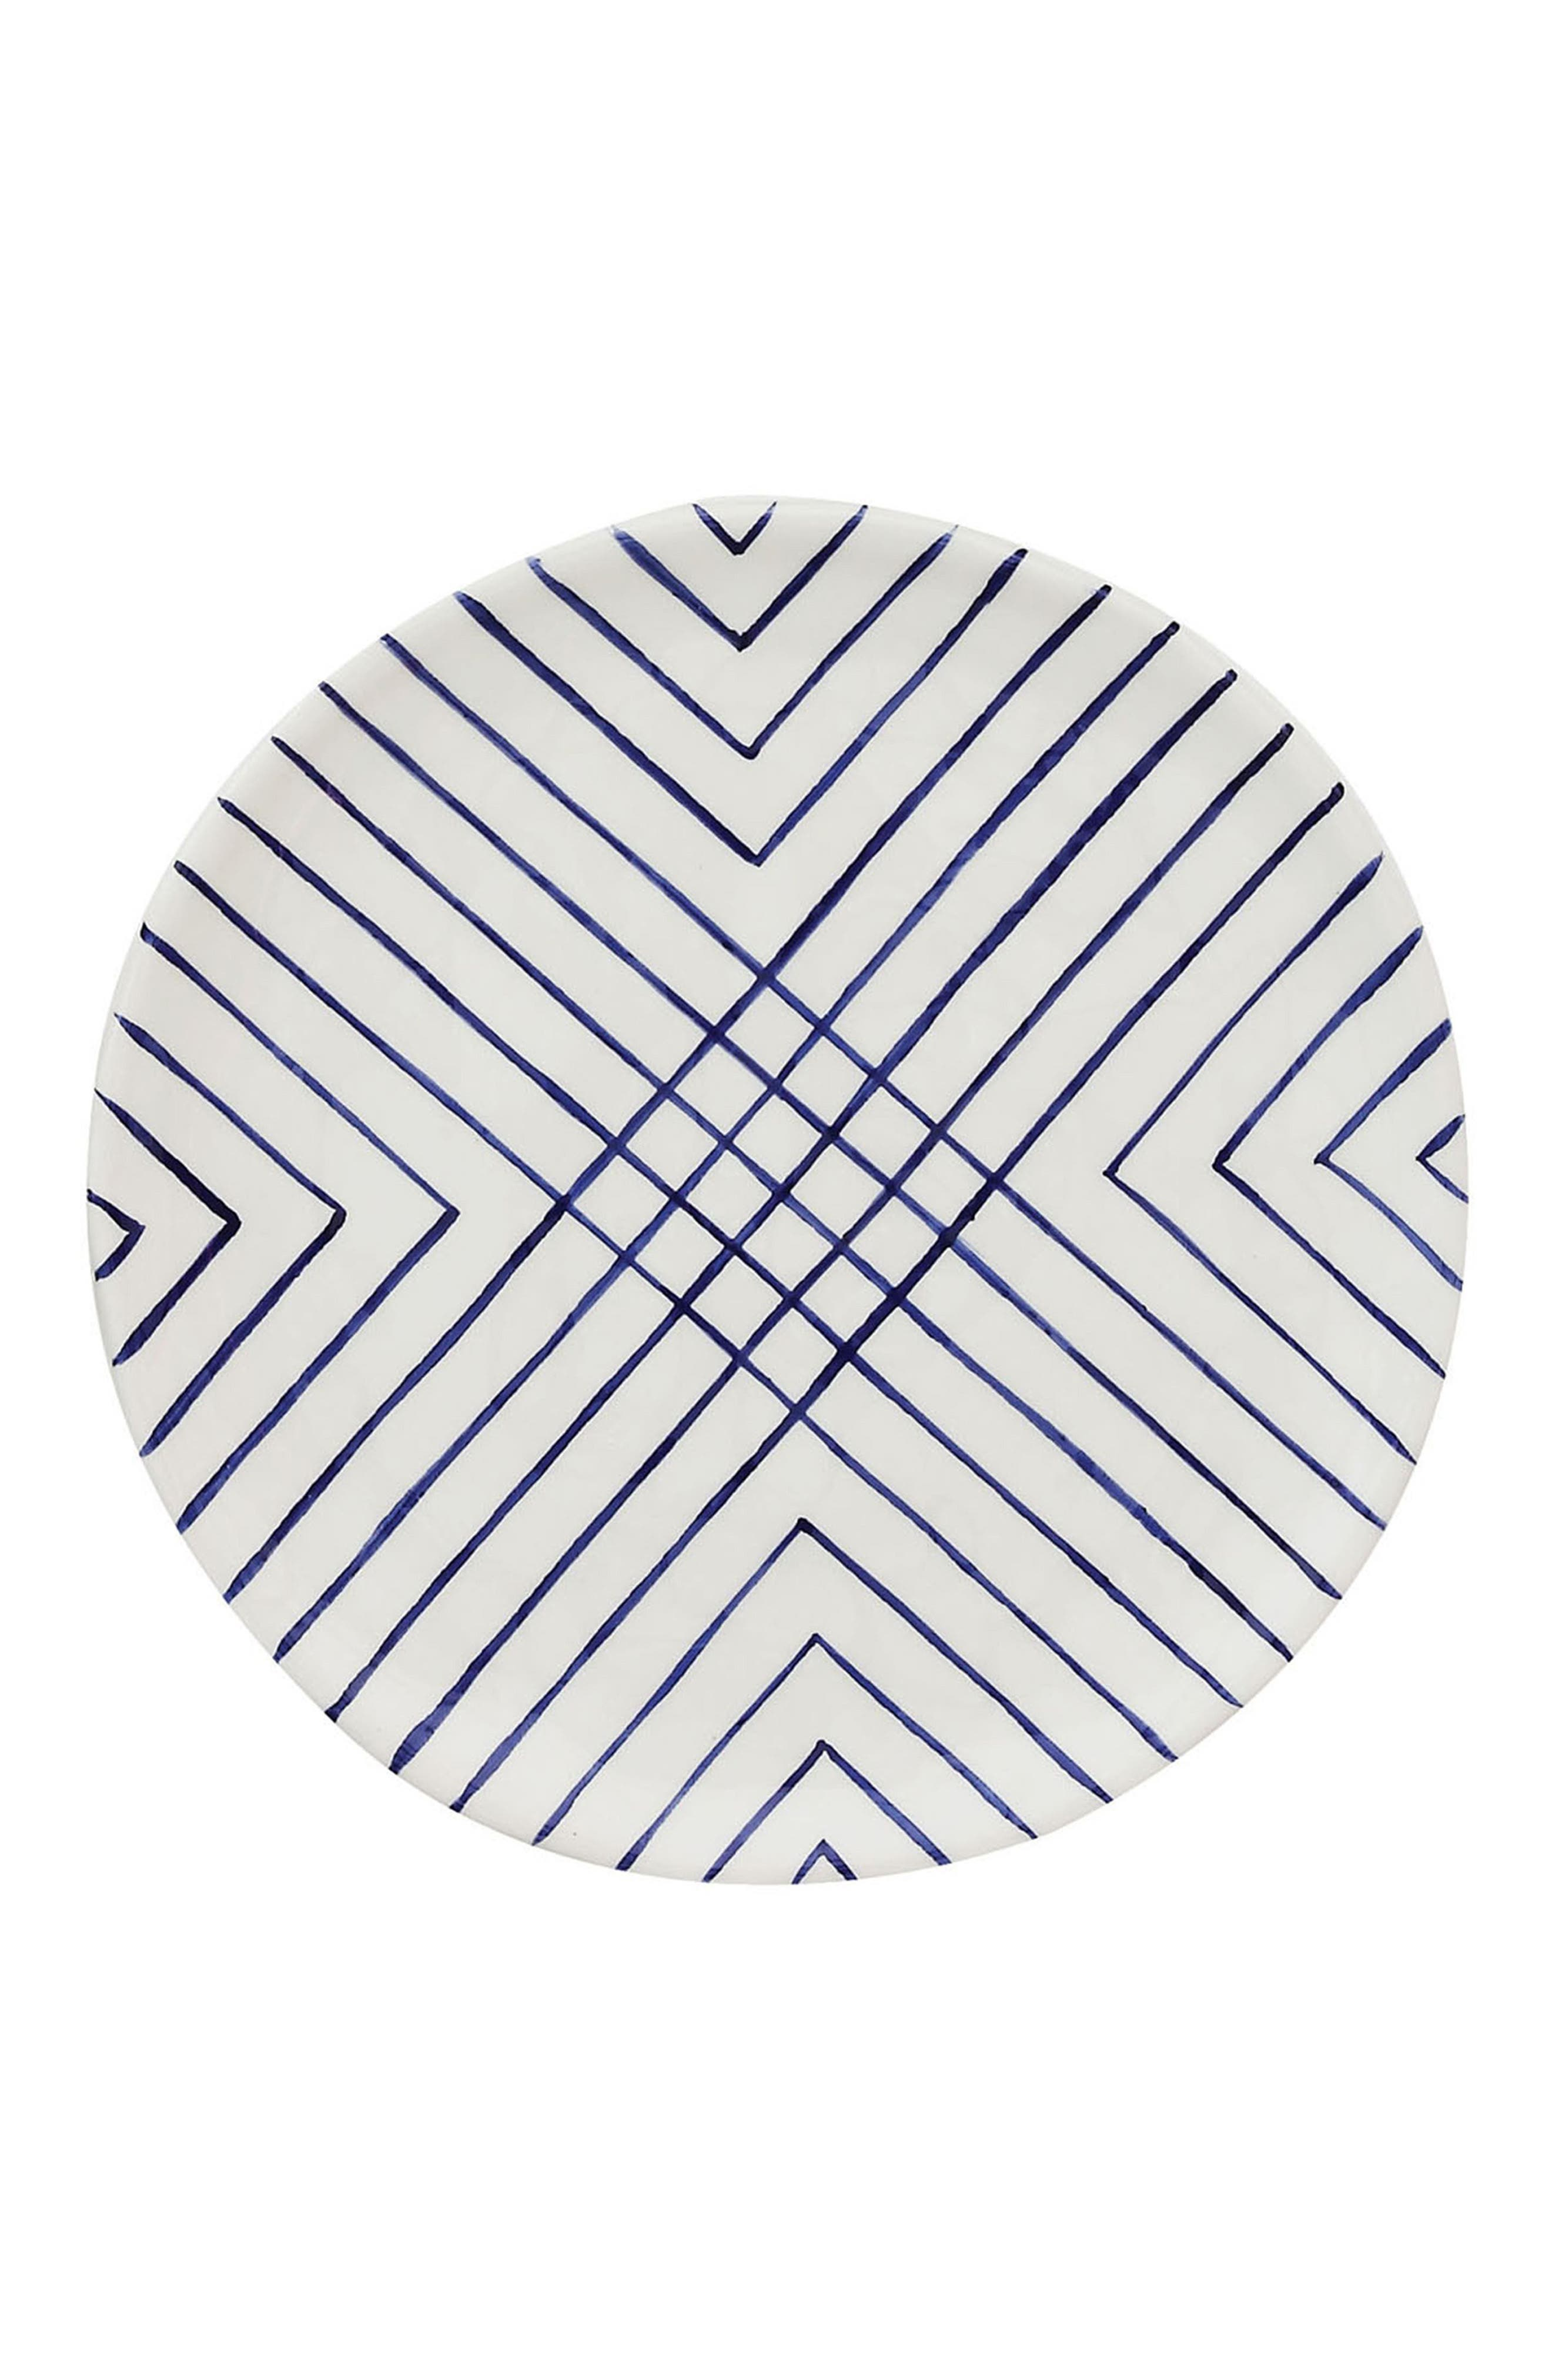 Blue & White Plate,                             Main thumbnail 1, color,                             400